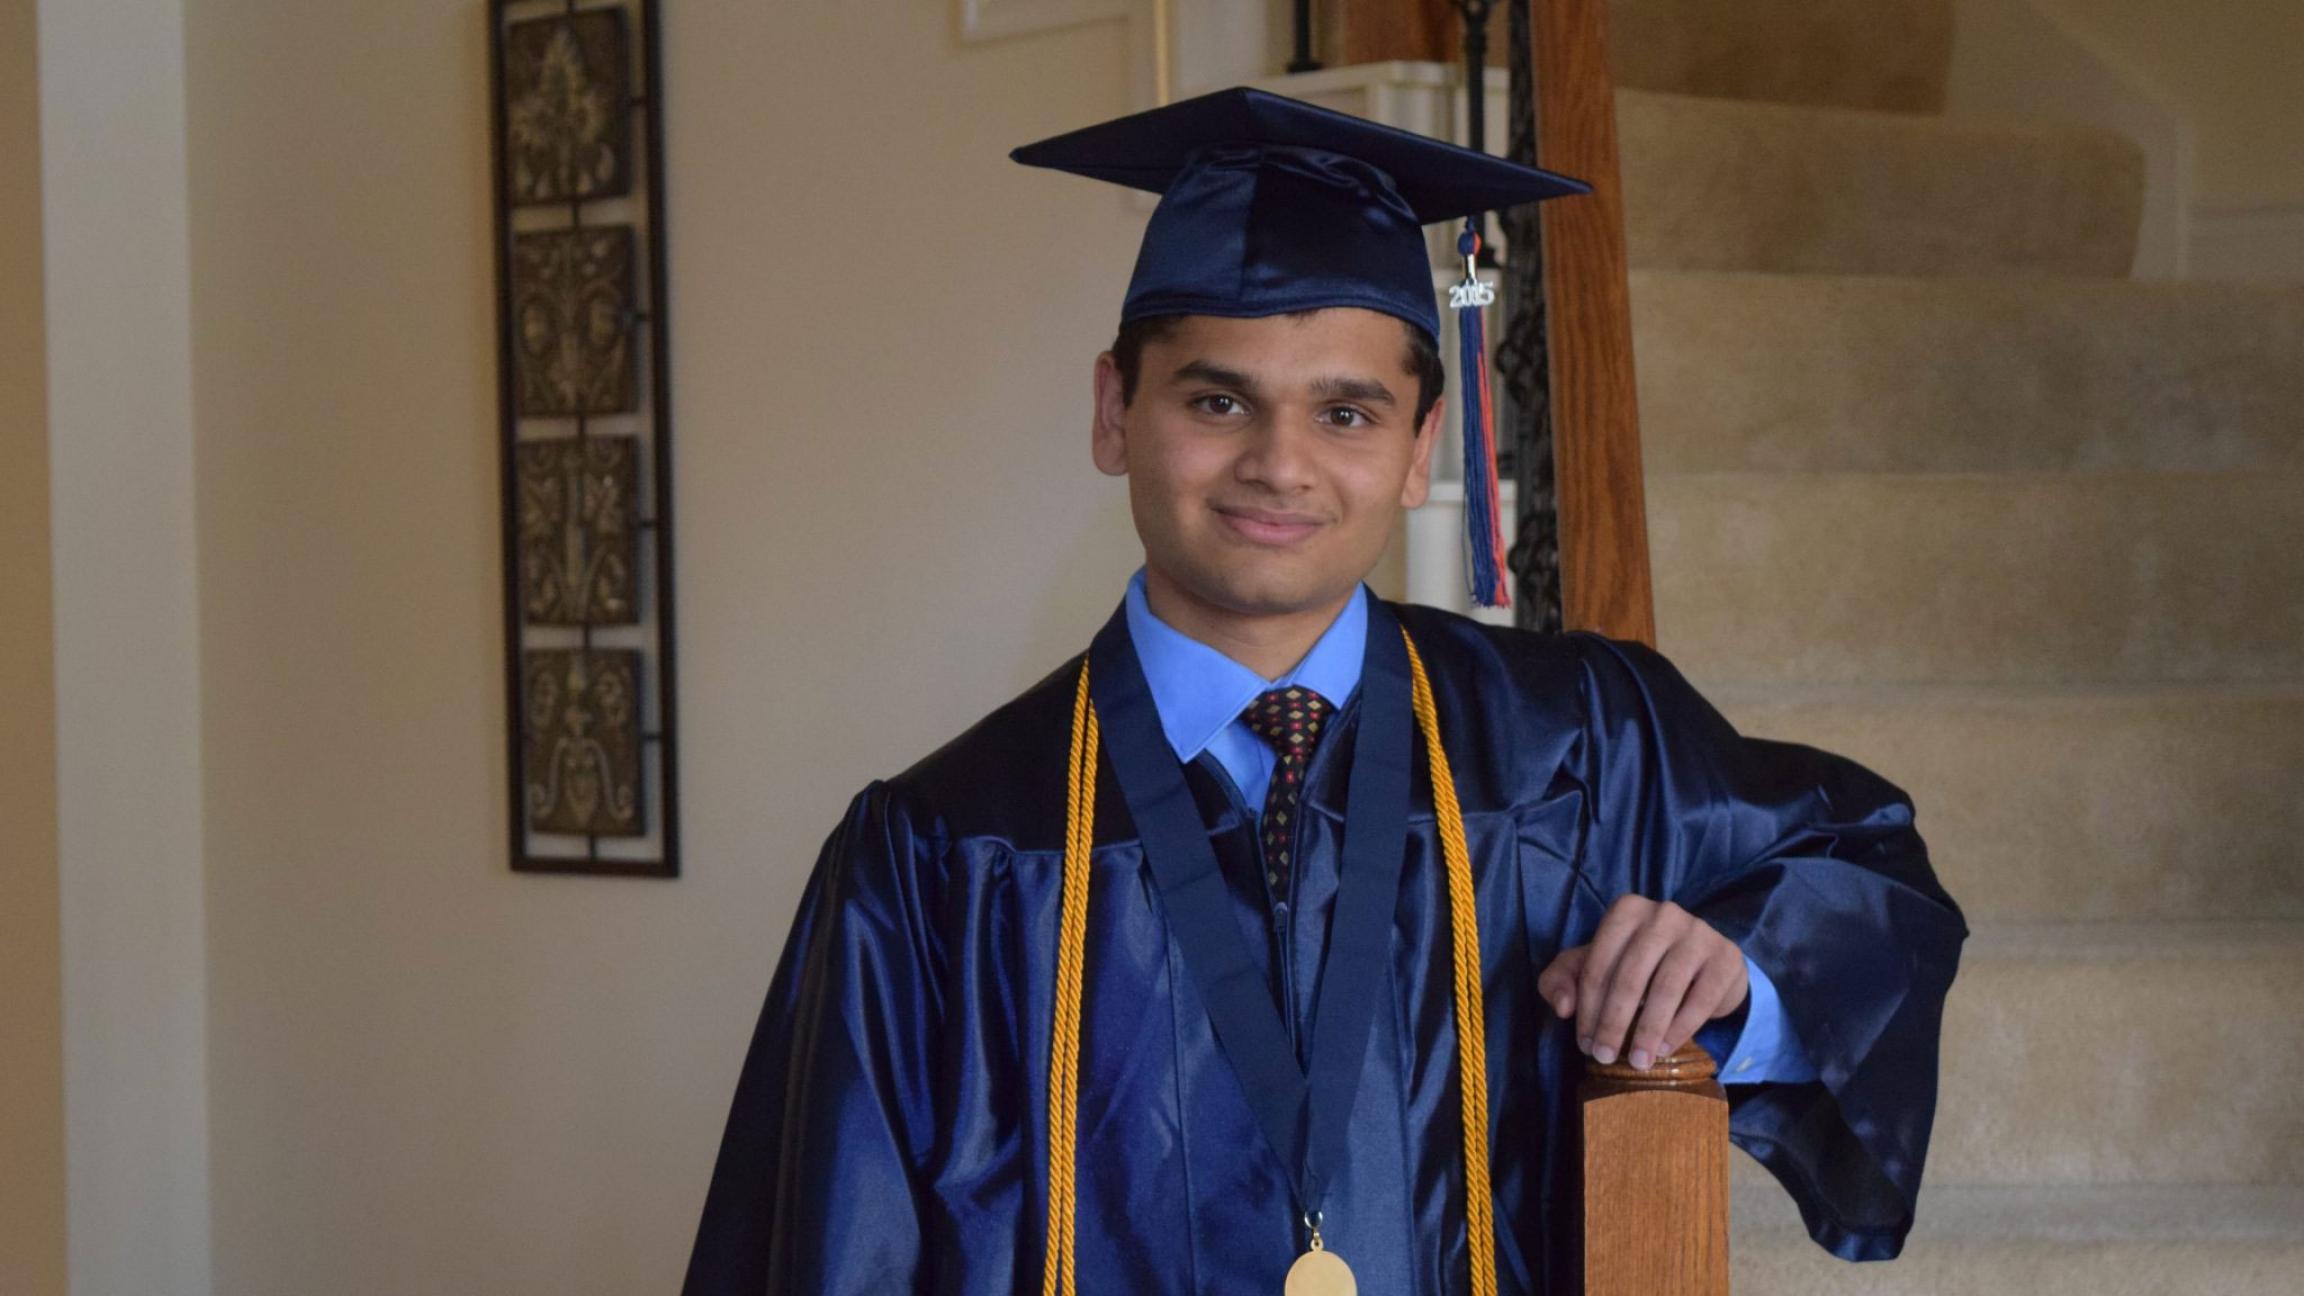 Animesh Namjoshi poses for a graduation photo after receiving his diploma at Seven Lakes High School